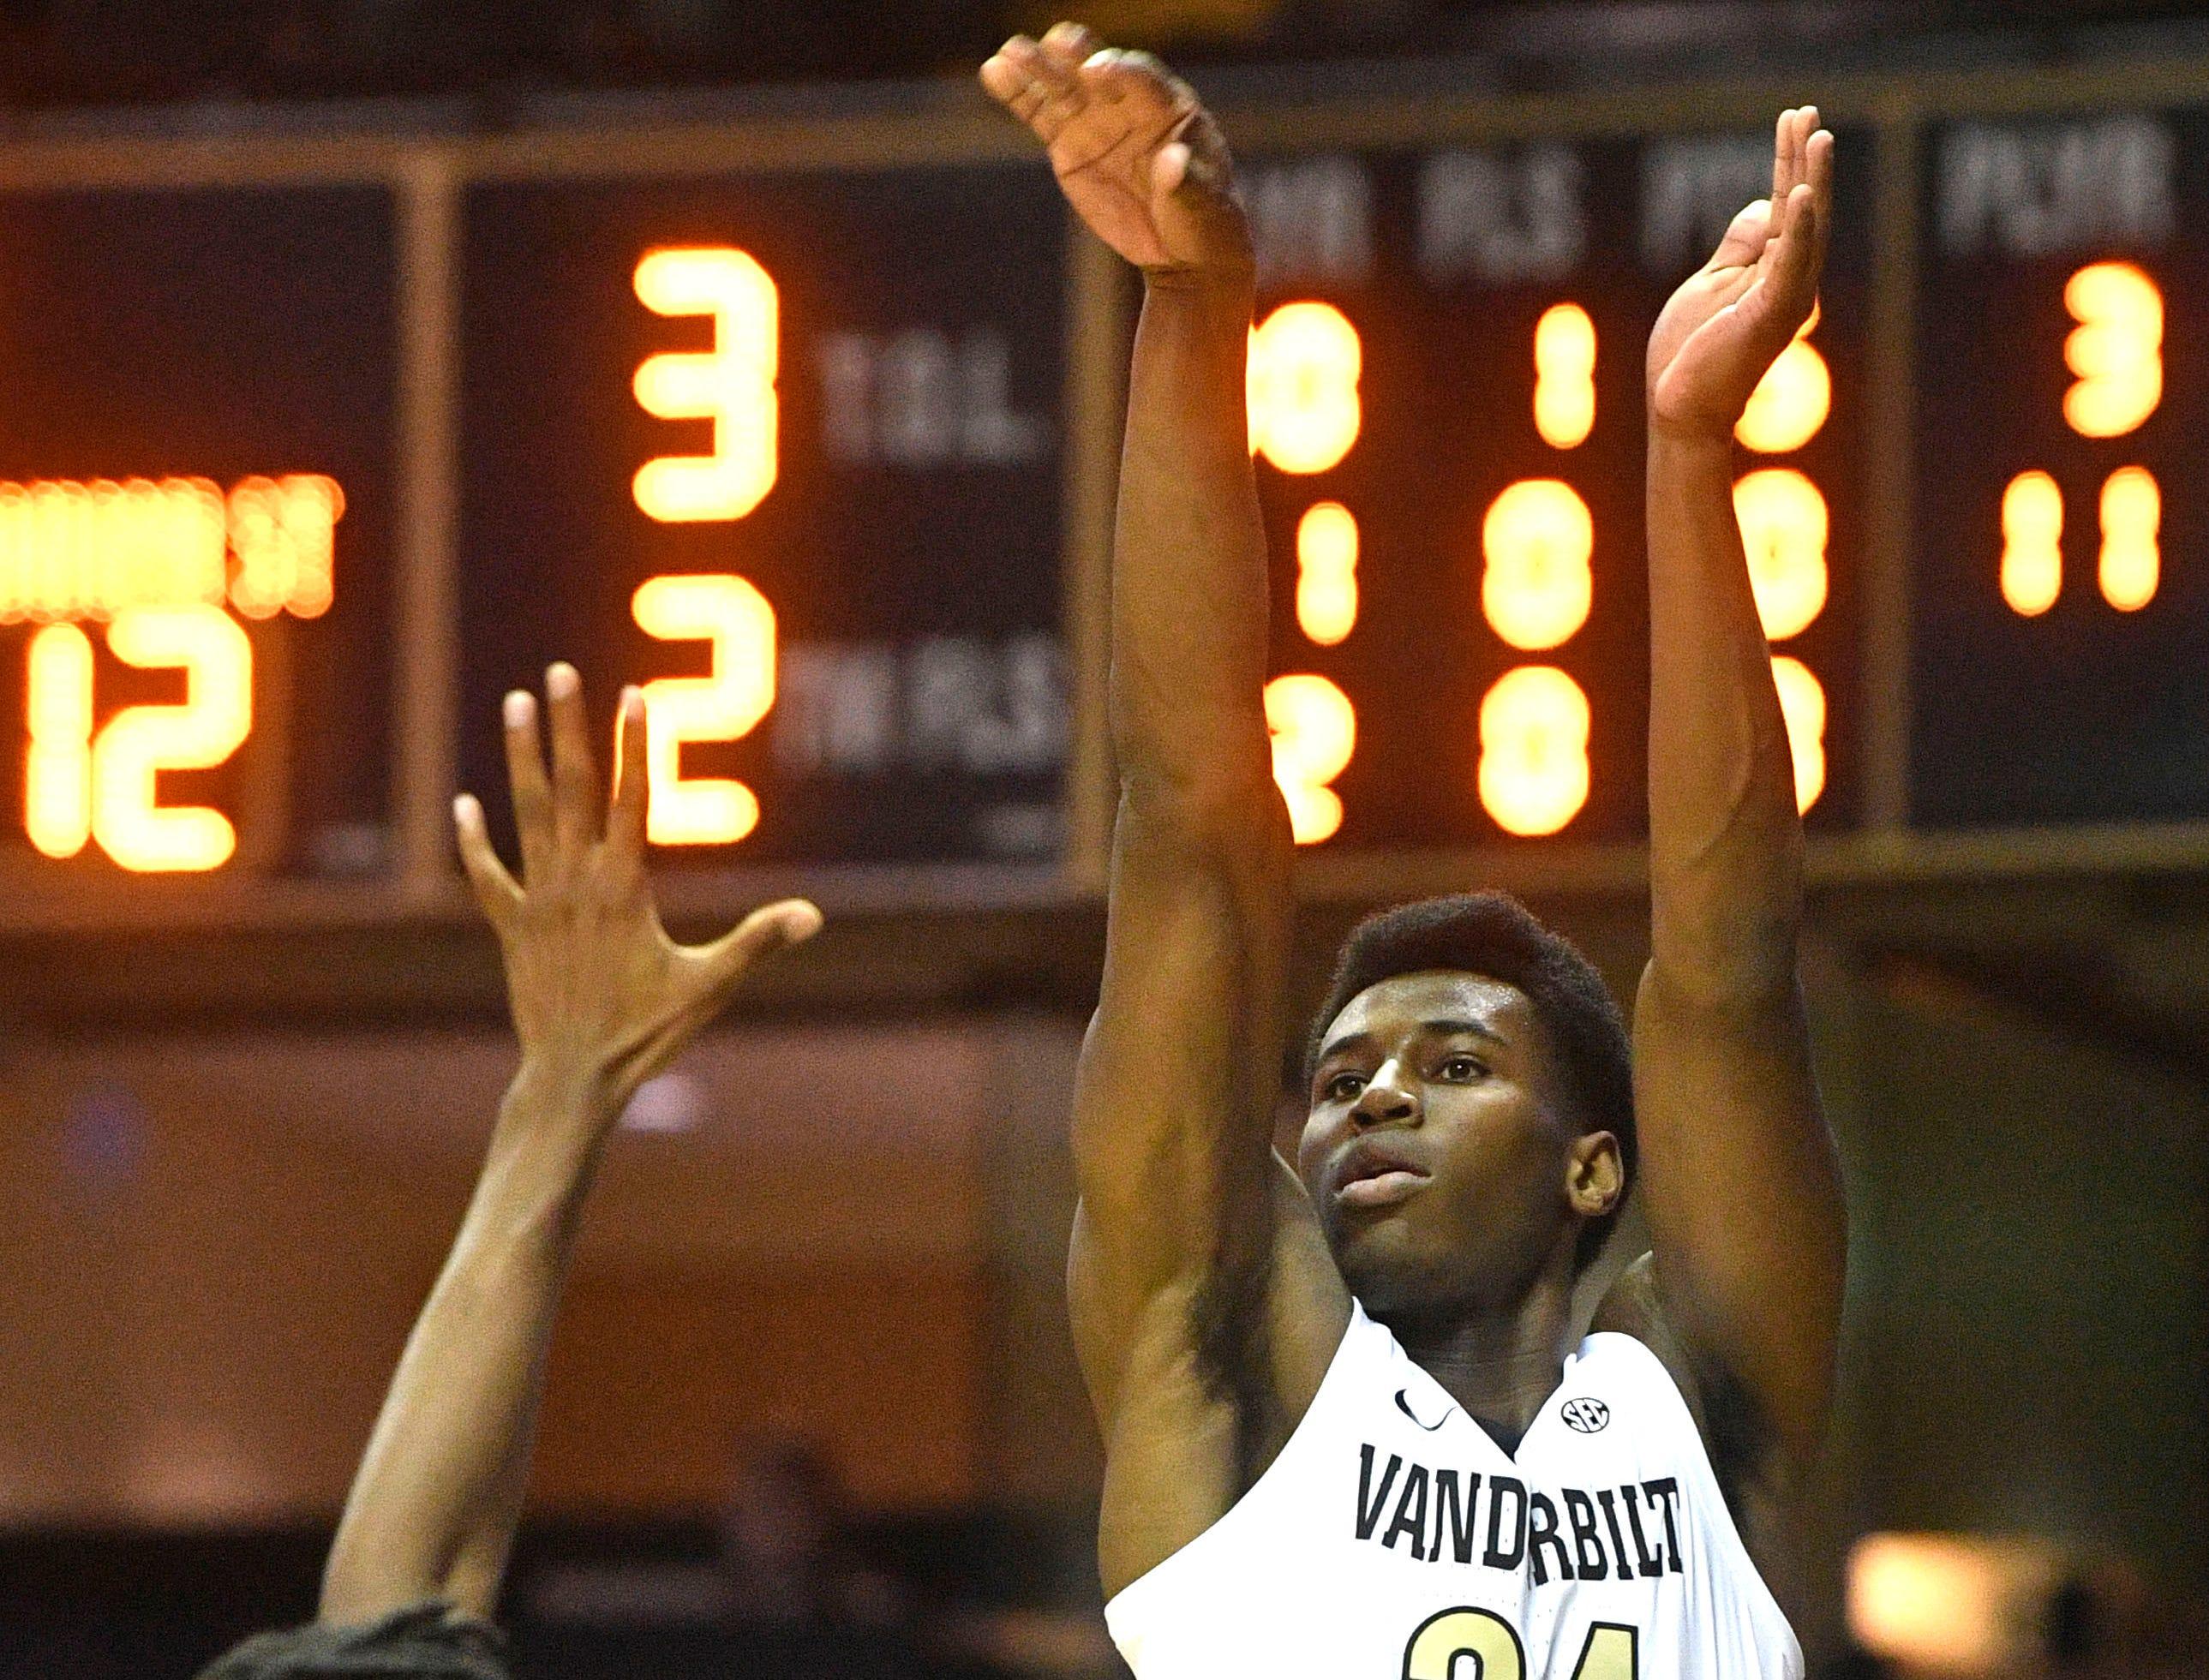 Vanderbilt Commodores forward Aaron Nesmith (24) shoots as Vanderbilt plays Savannah State at Memorial Gym Tuesday Nov. 27, 2018, in Nashville, Tenn.